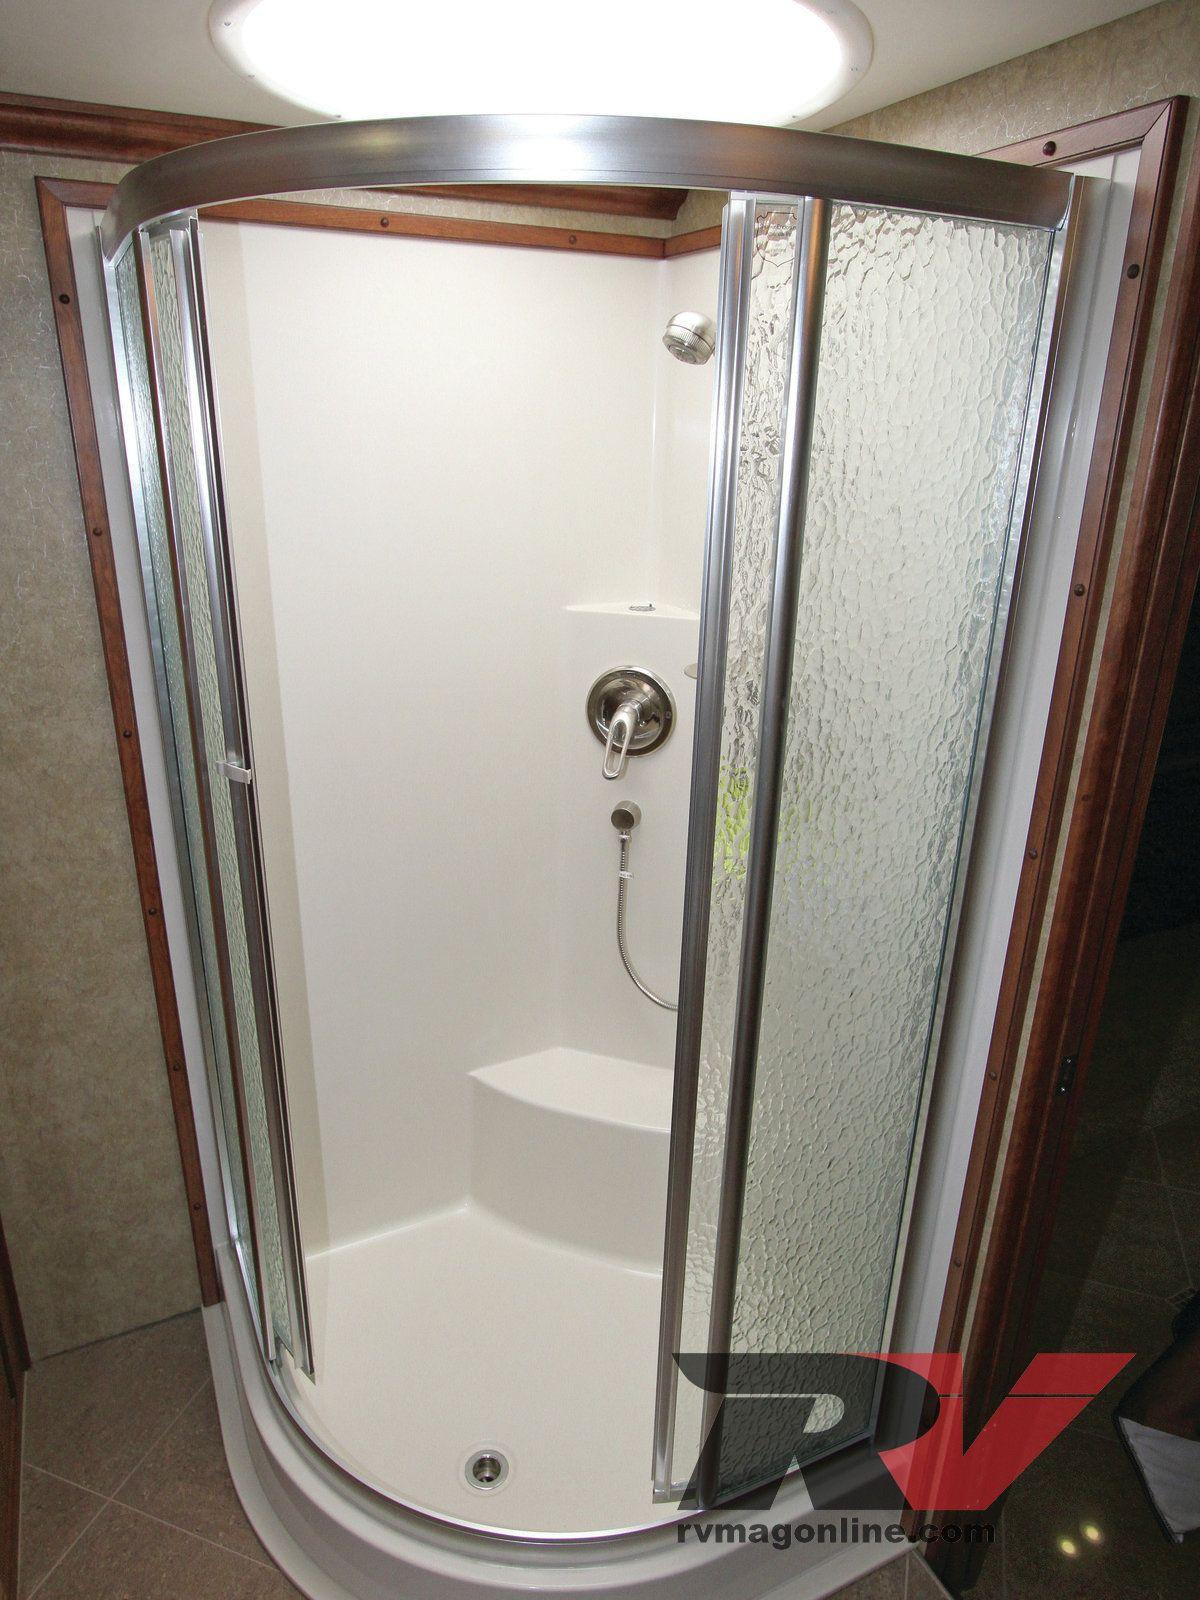 Rv Shower Enclosure America Shower Doors Shower Curtain Decor